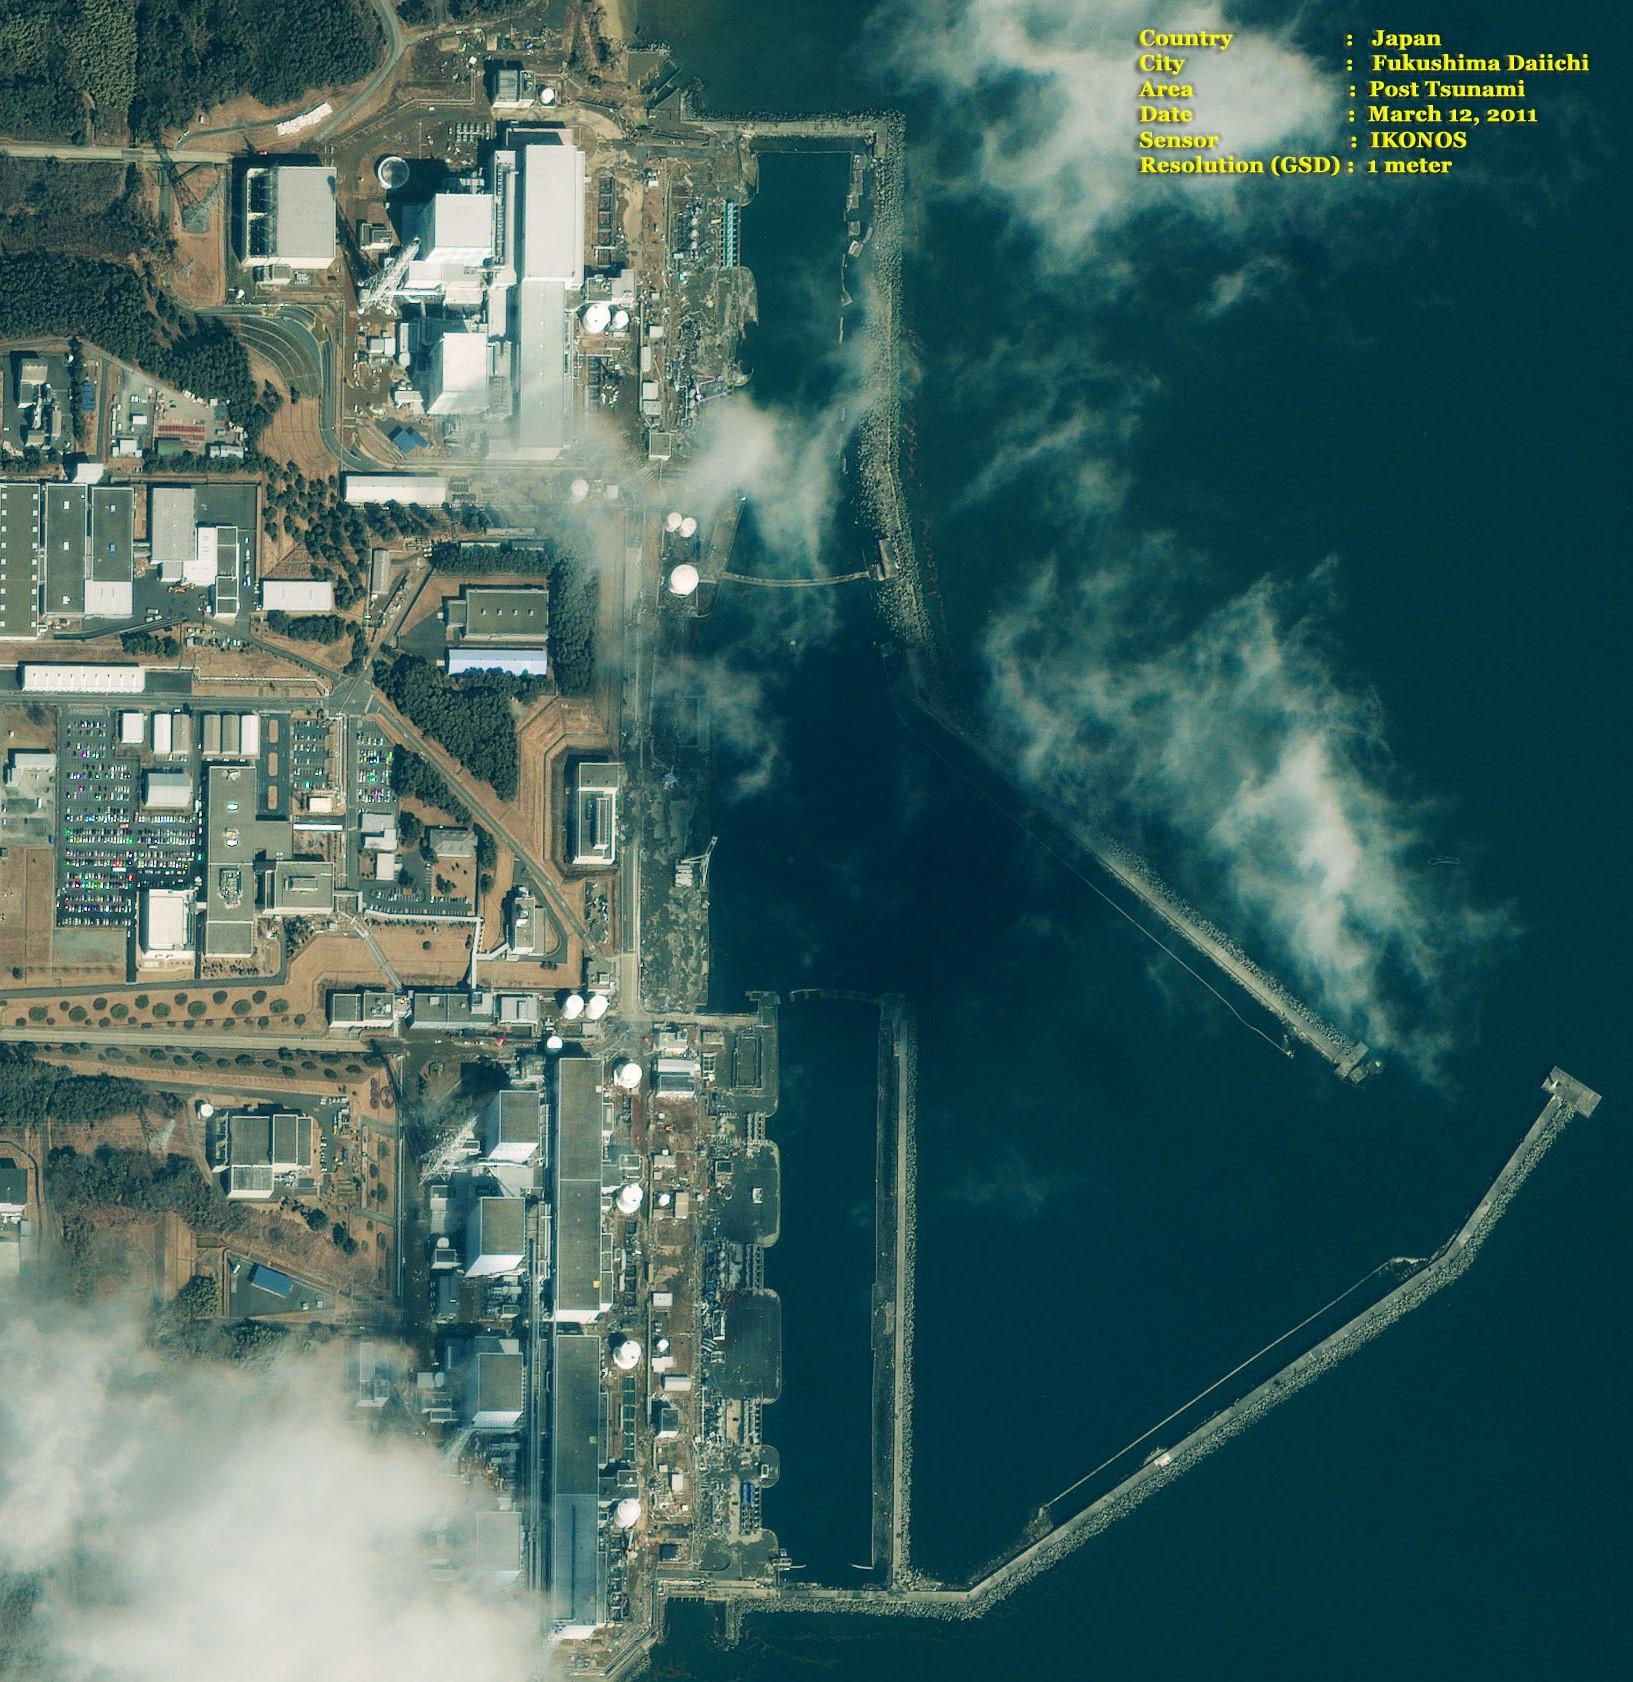 Fukushima Nuclear Plant  Post Tsunami